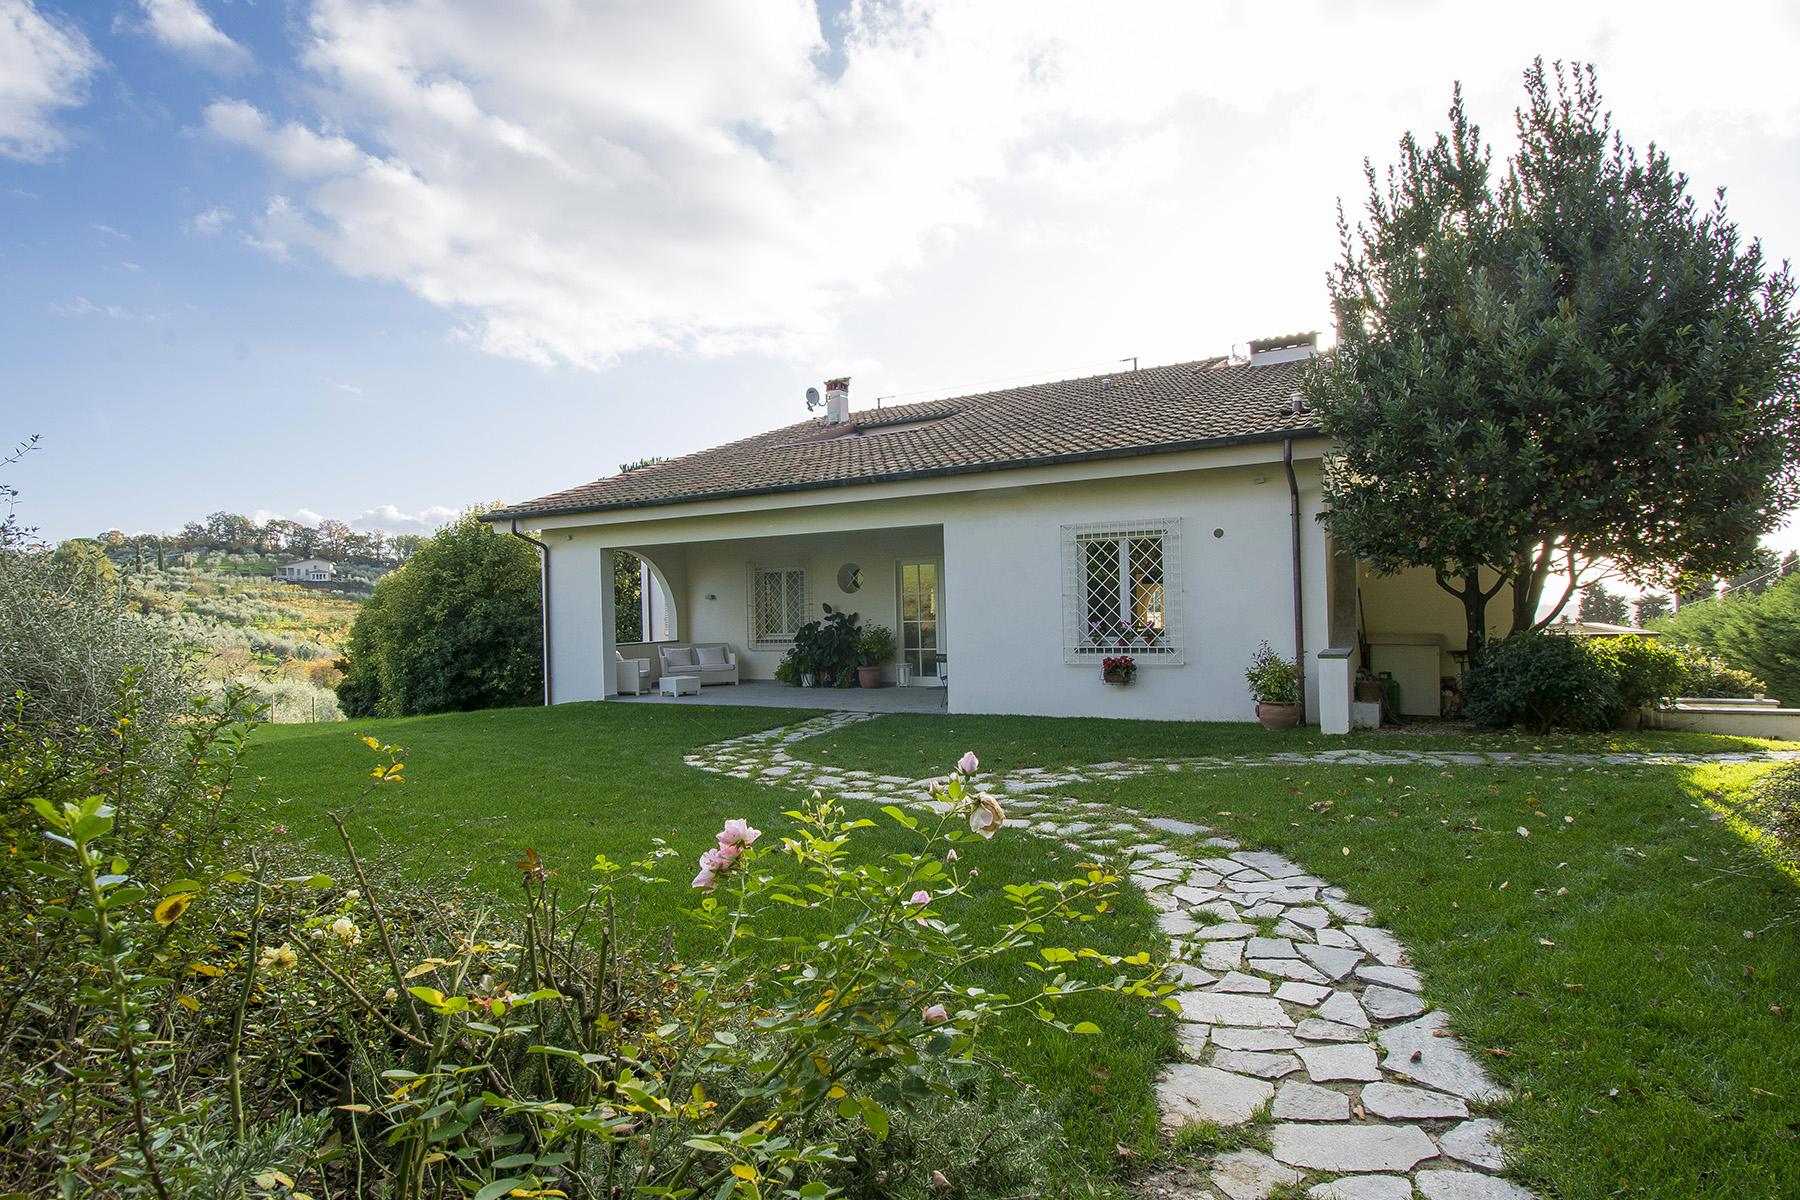 Villa in Vendita a Lucca: 5 locali, 470 mq - Foto 25